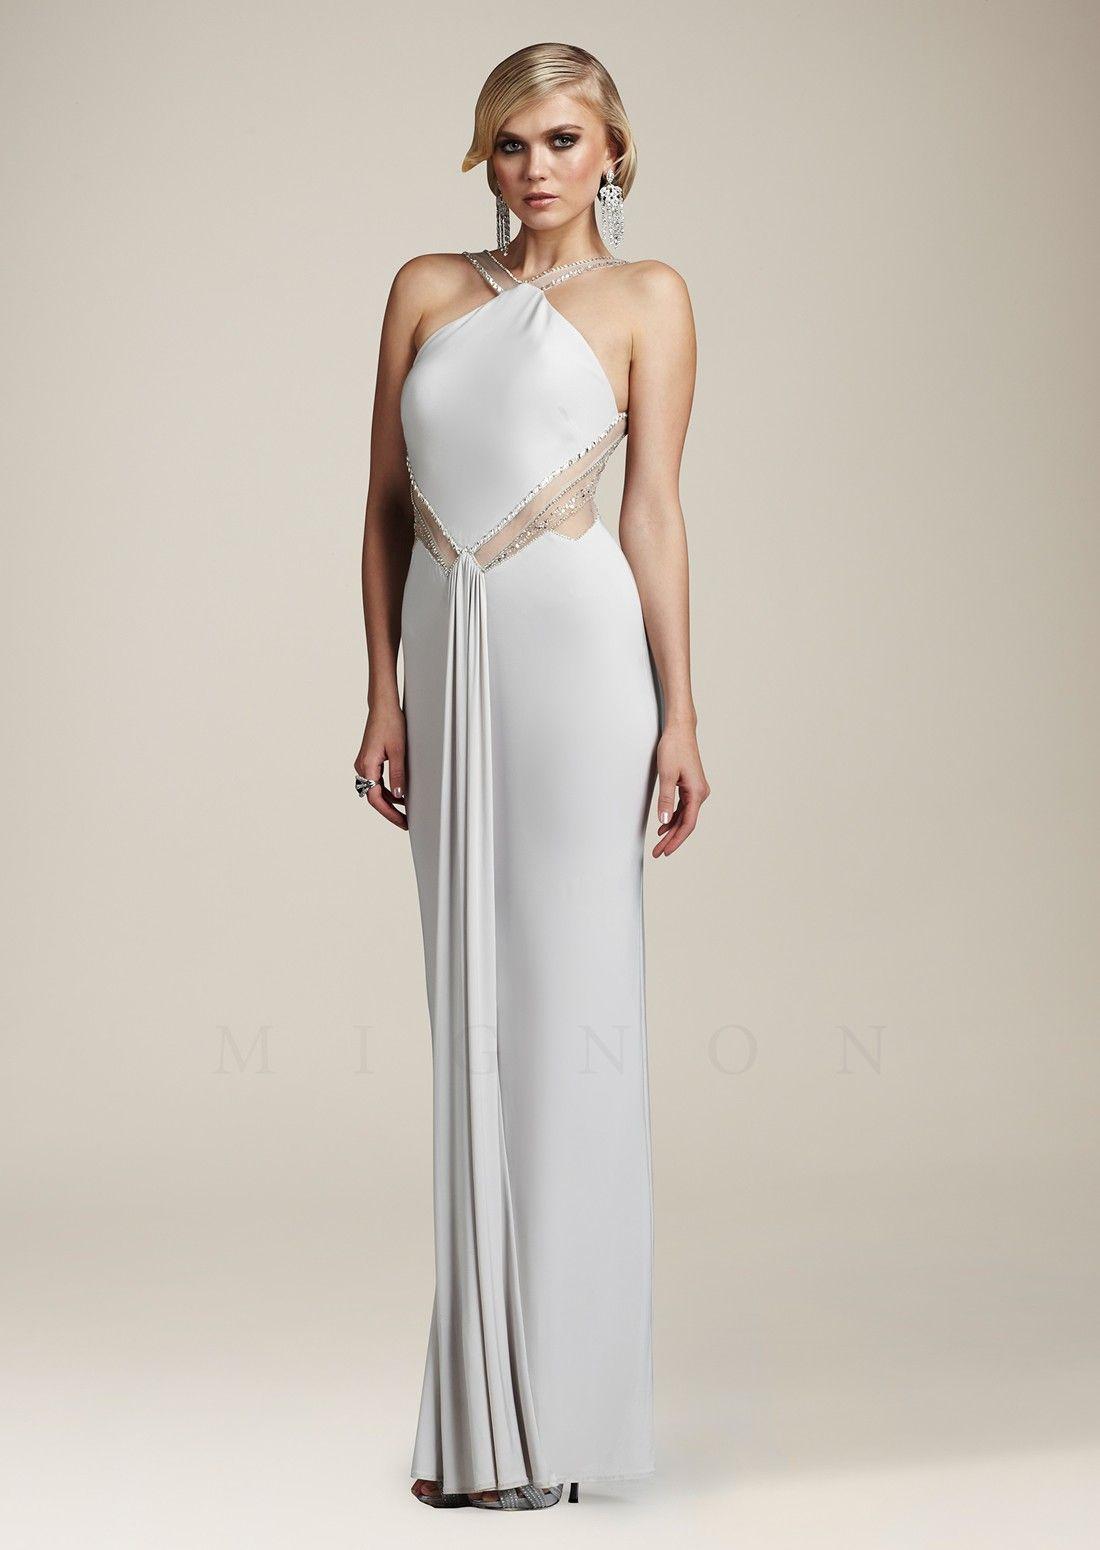 Atlanta wedding dress shops  Mignon Prom DressVM  Mignon Prom Dresses  Pinterest  Full